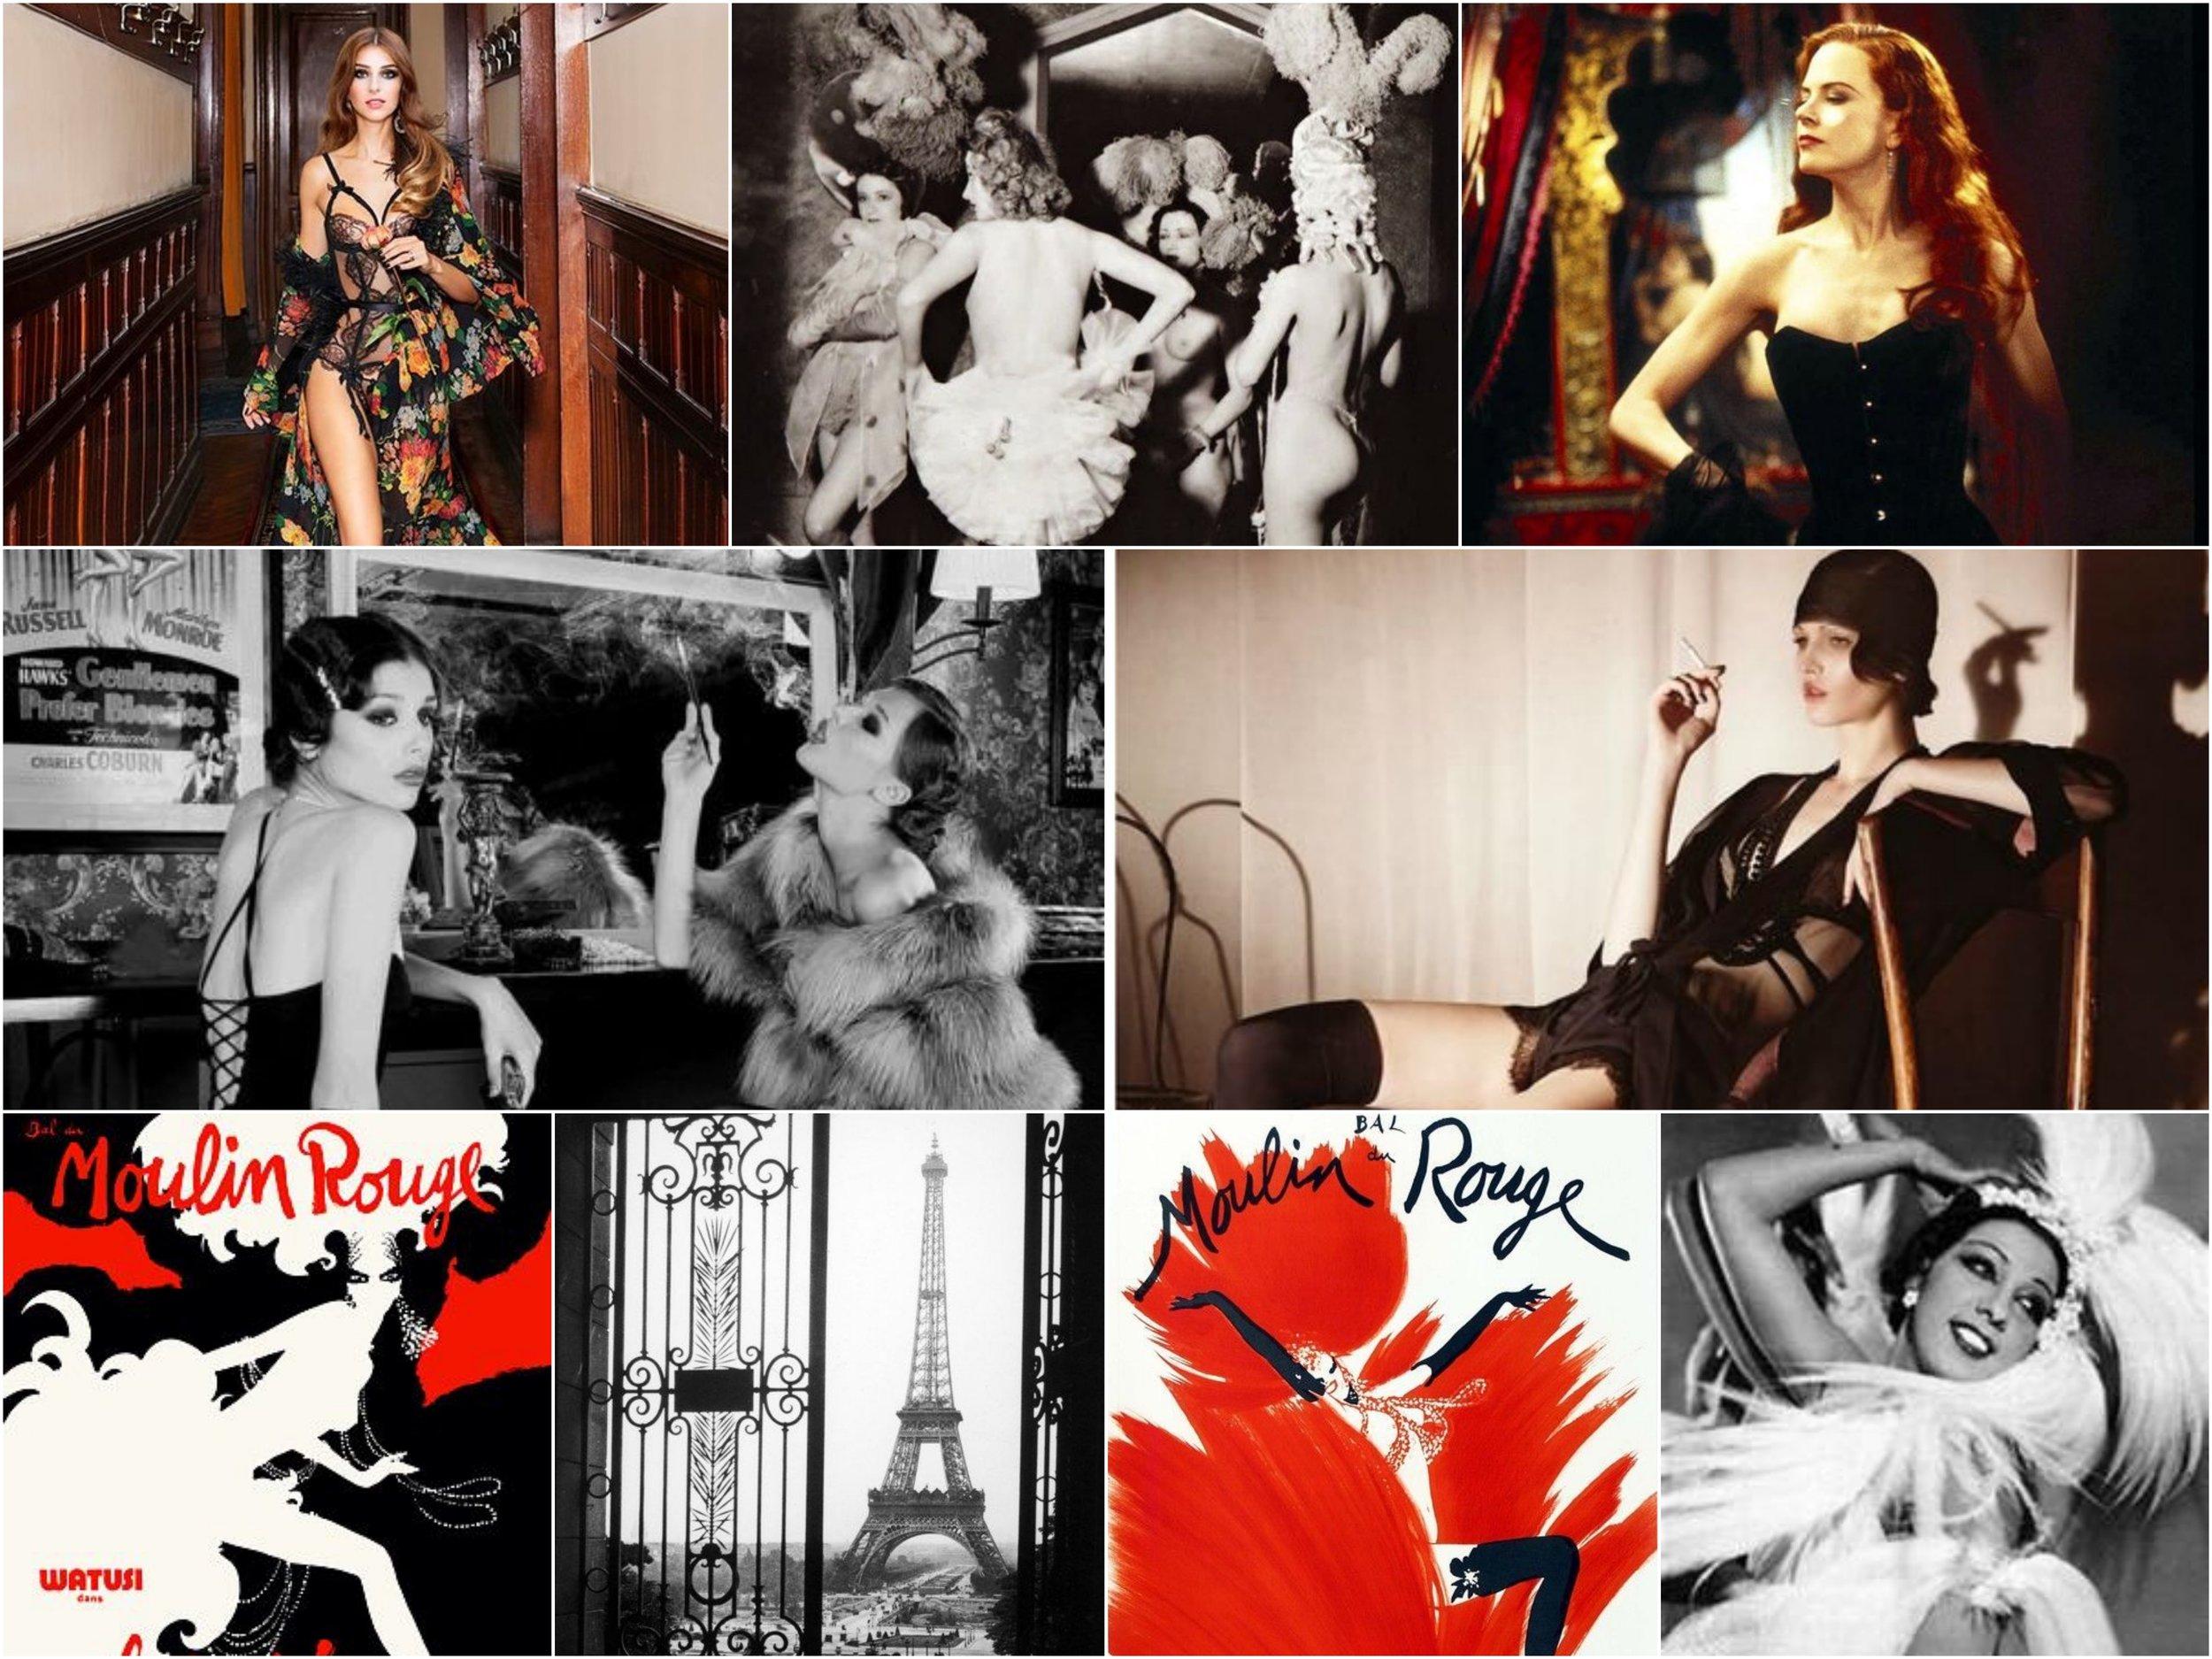 Photo credit (clockwise from upper left): Agent Provocateur // Vintage Everyday // Refinery 29 // German Vogue // Josephine Baker // Vintage Venus // BuzzFeed // Vintage Venus // Little Pawz